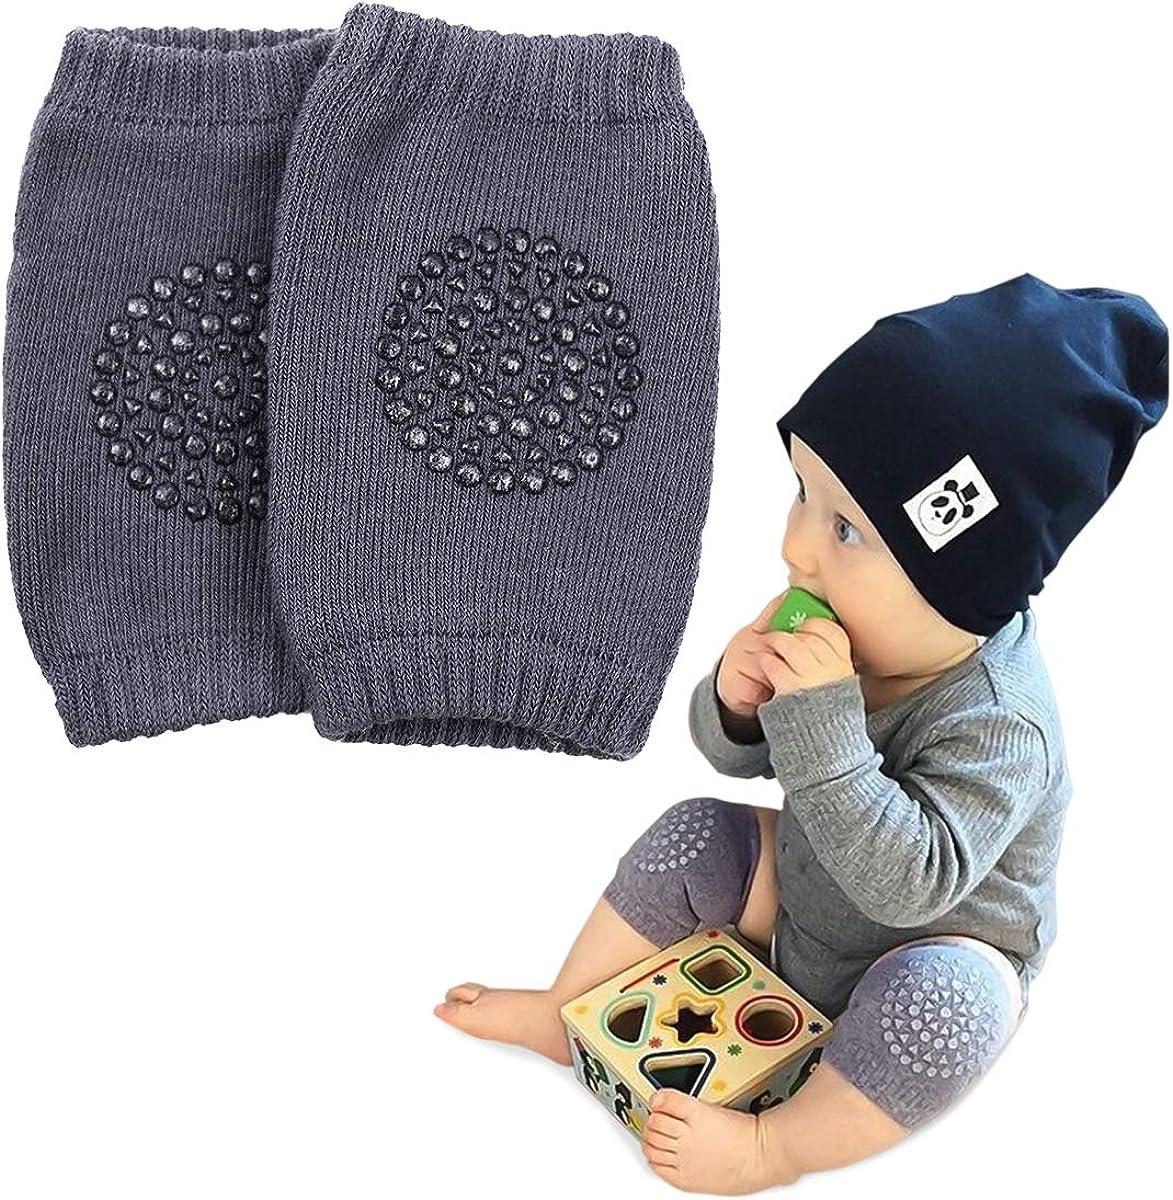 Baby Knee Pads,Toddler Baby Knee Pad, Adjustable Elastic Cotton Baby Crawling Knee Pads Baby Toddler Anti-Skid Kneepads Leg Warmers Unisex (Dark Gray)